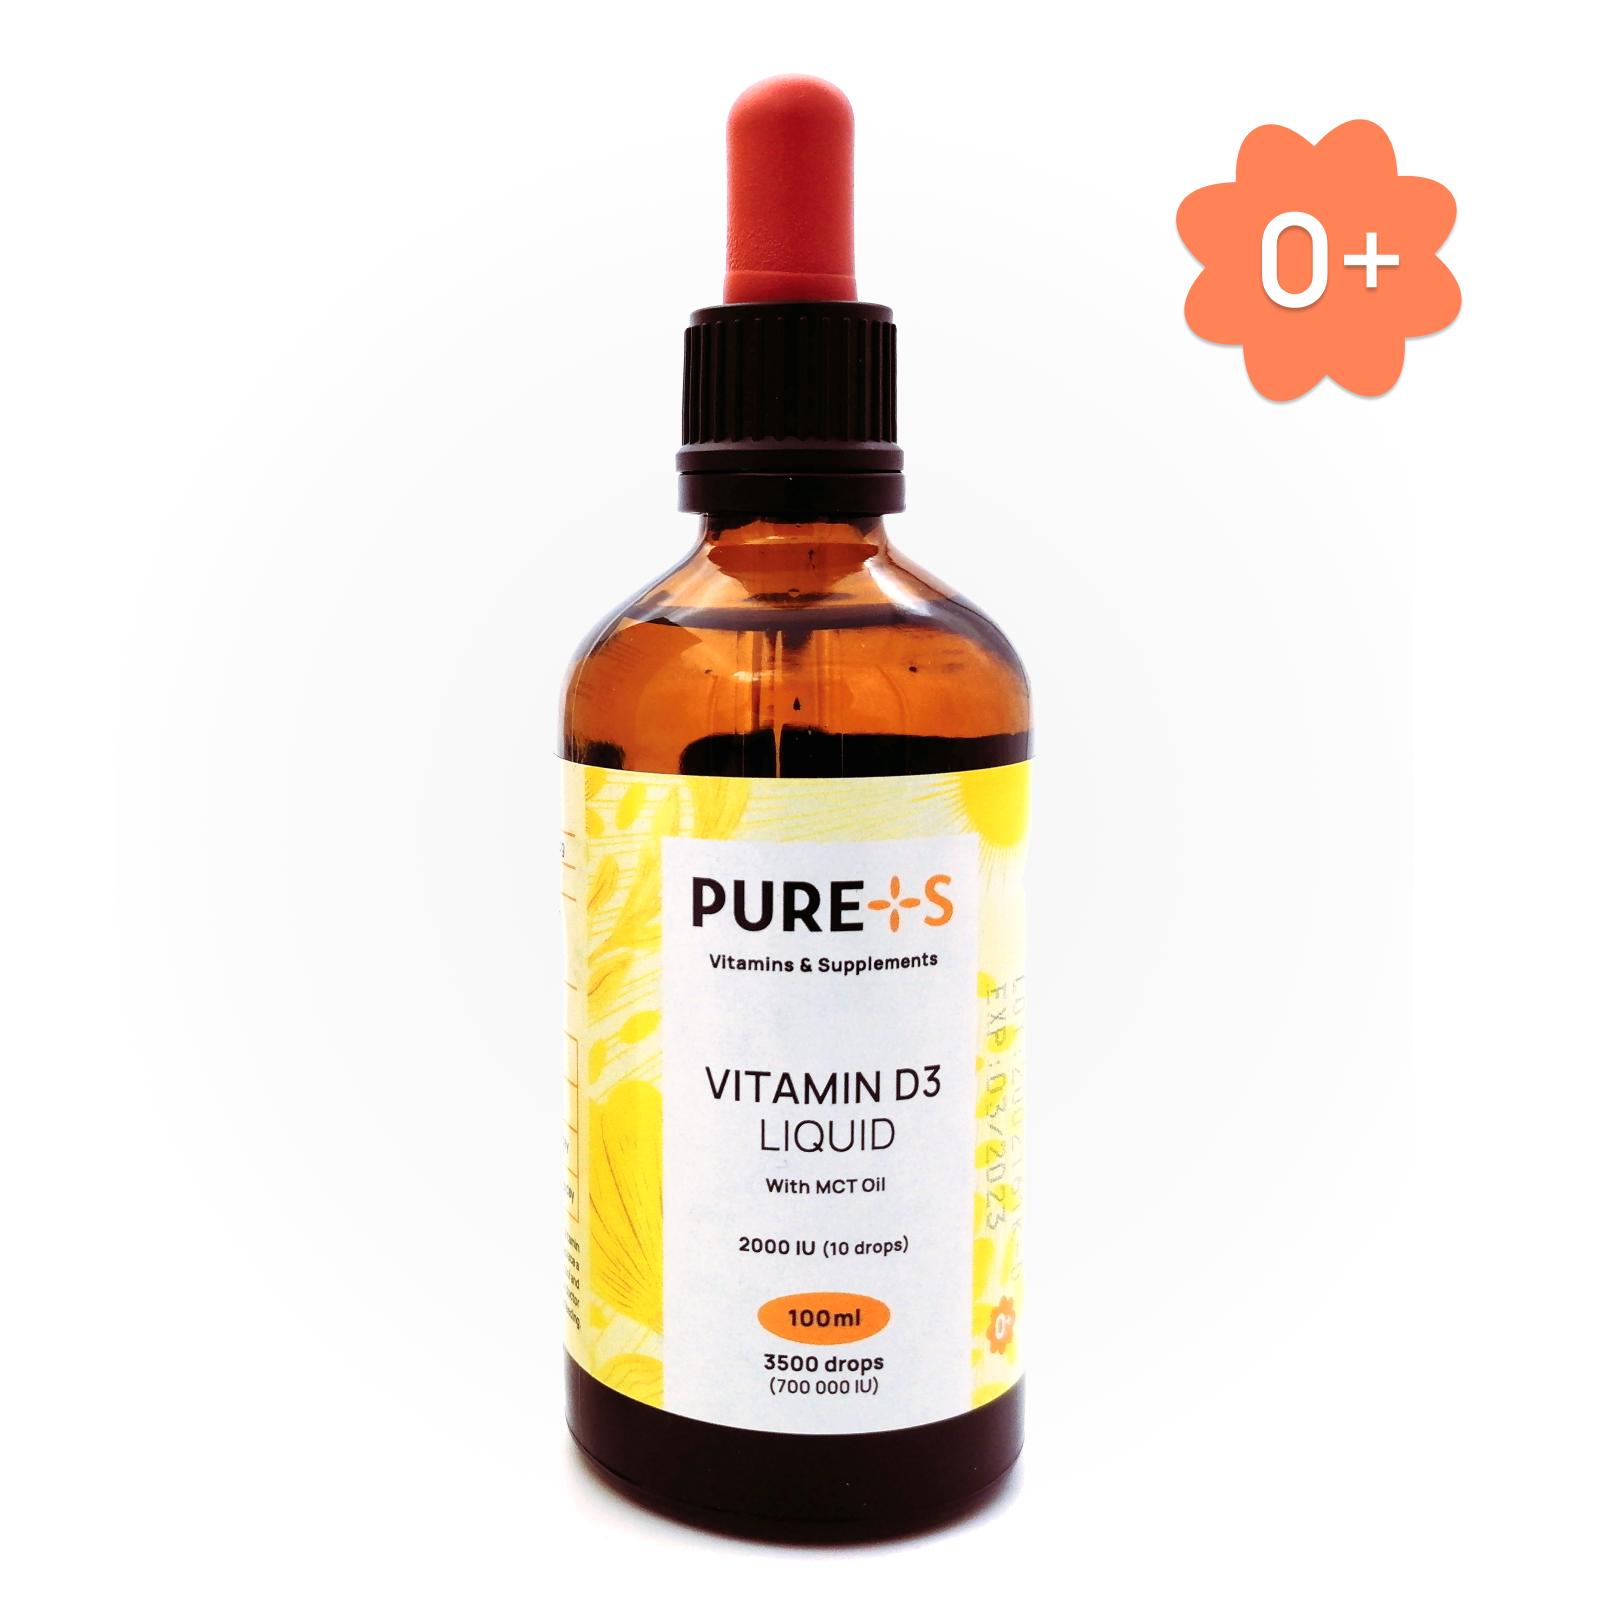 Витамин Д, Vitamin D3, PURE+S, 100 ml